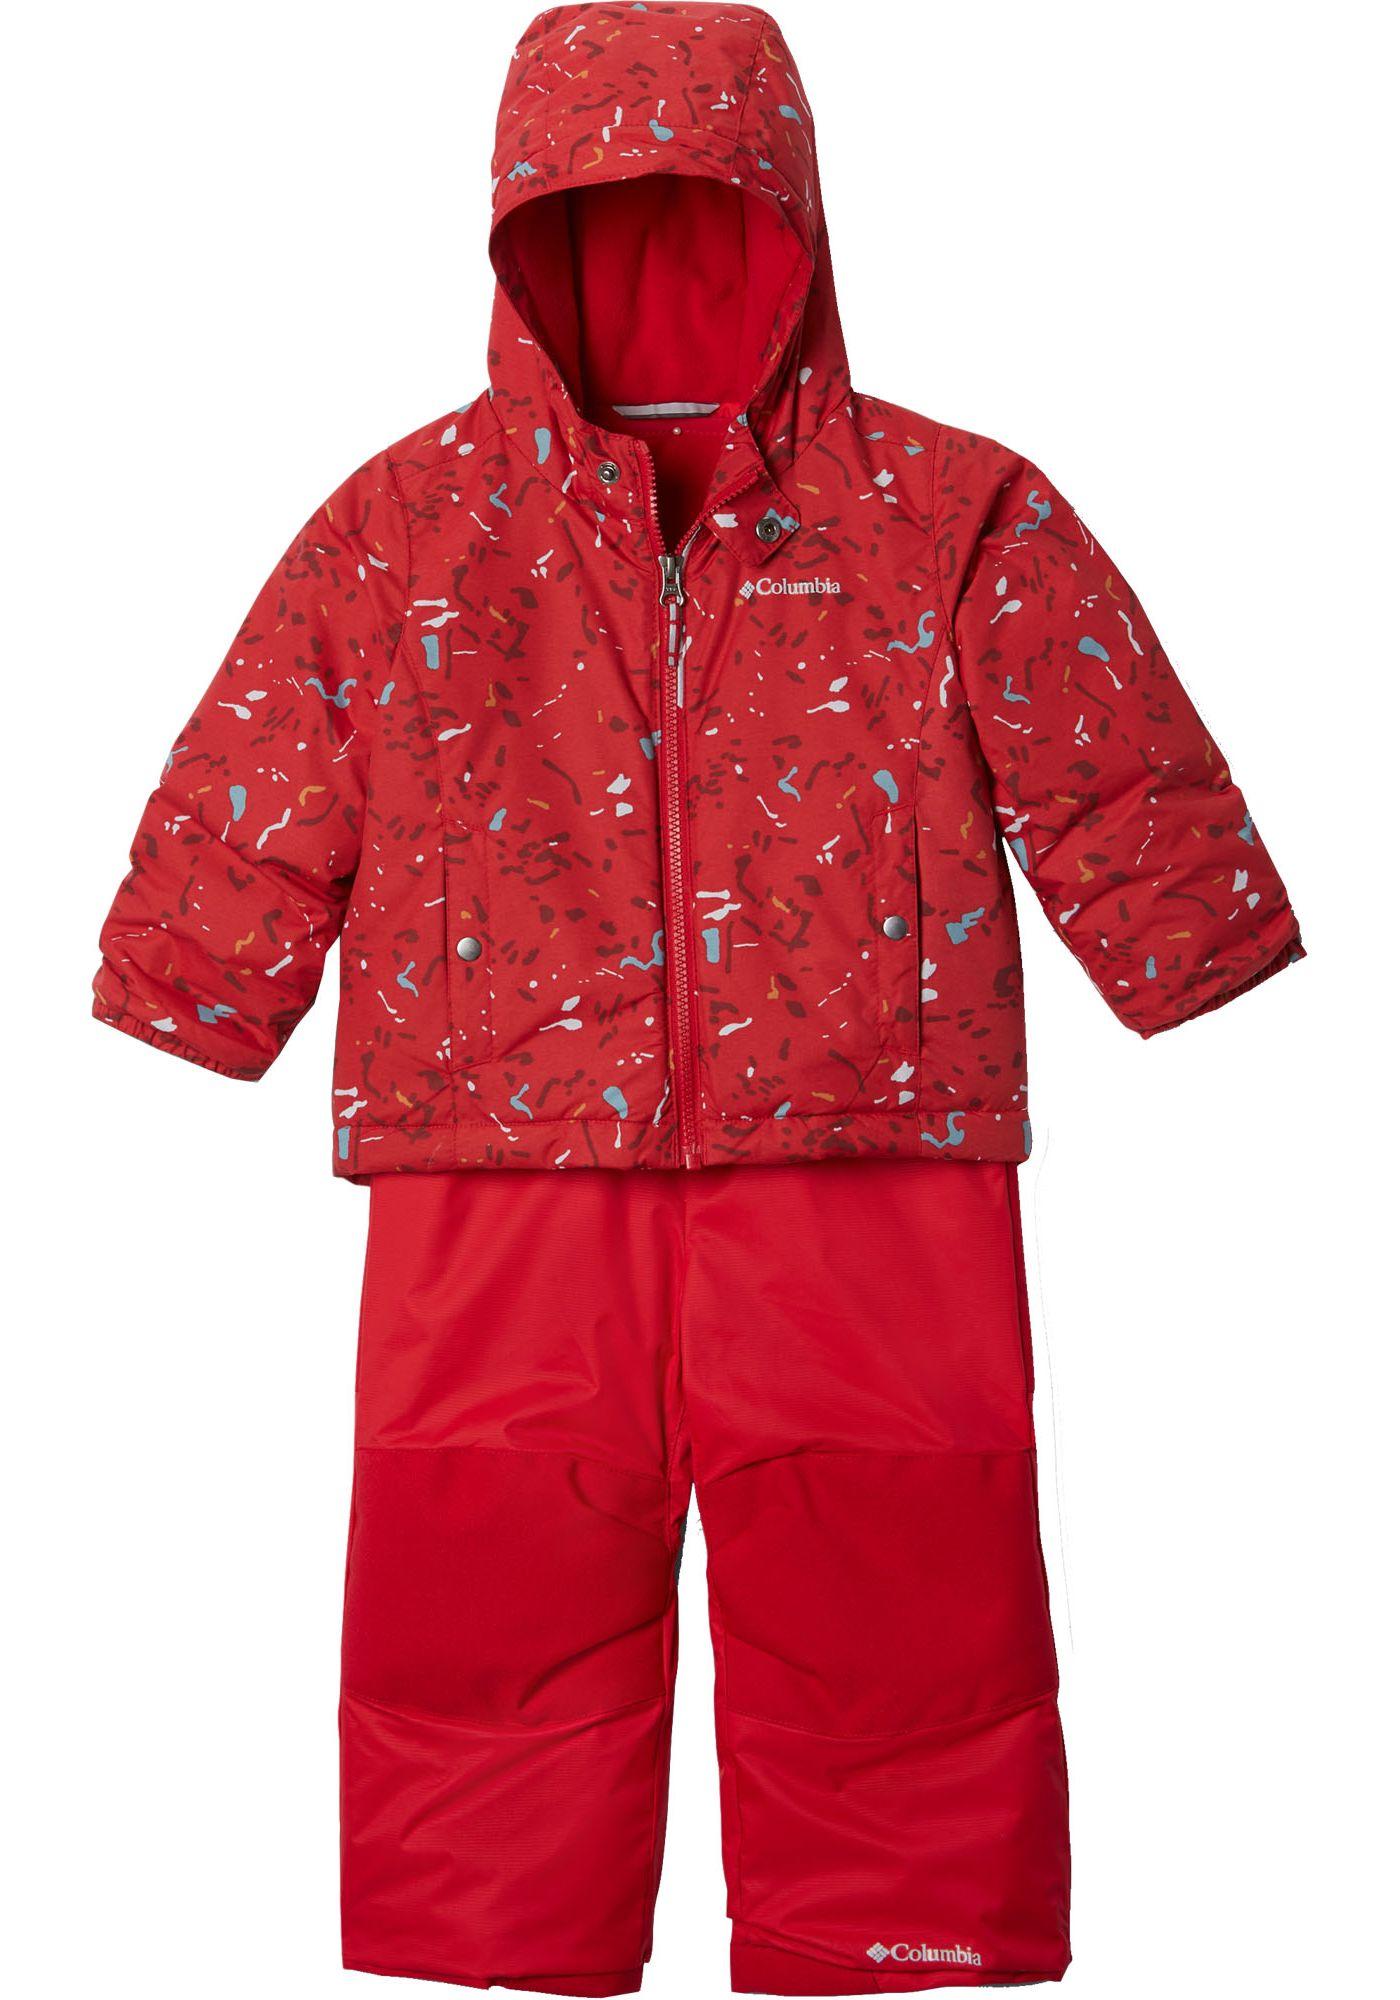 Columbia Toddler Boys' Frosty Slope Set